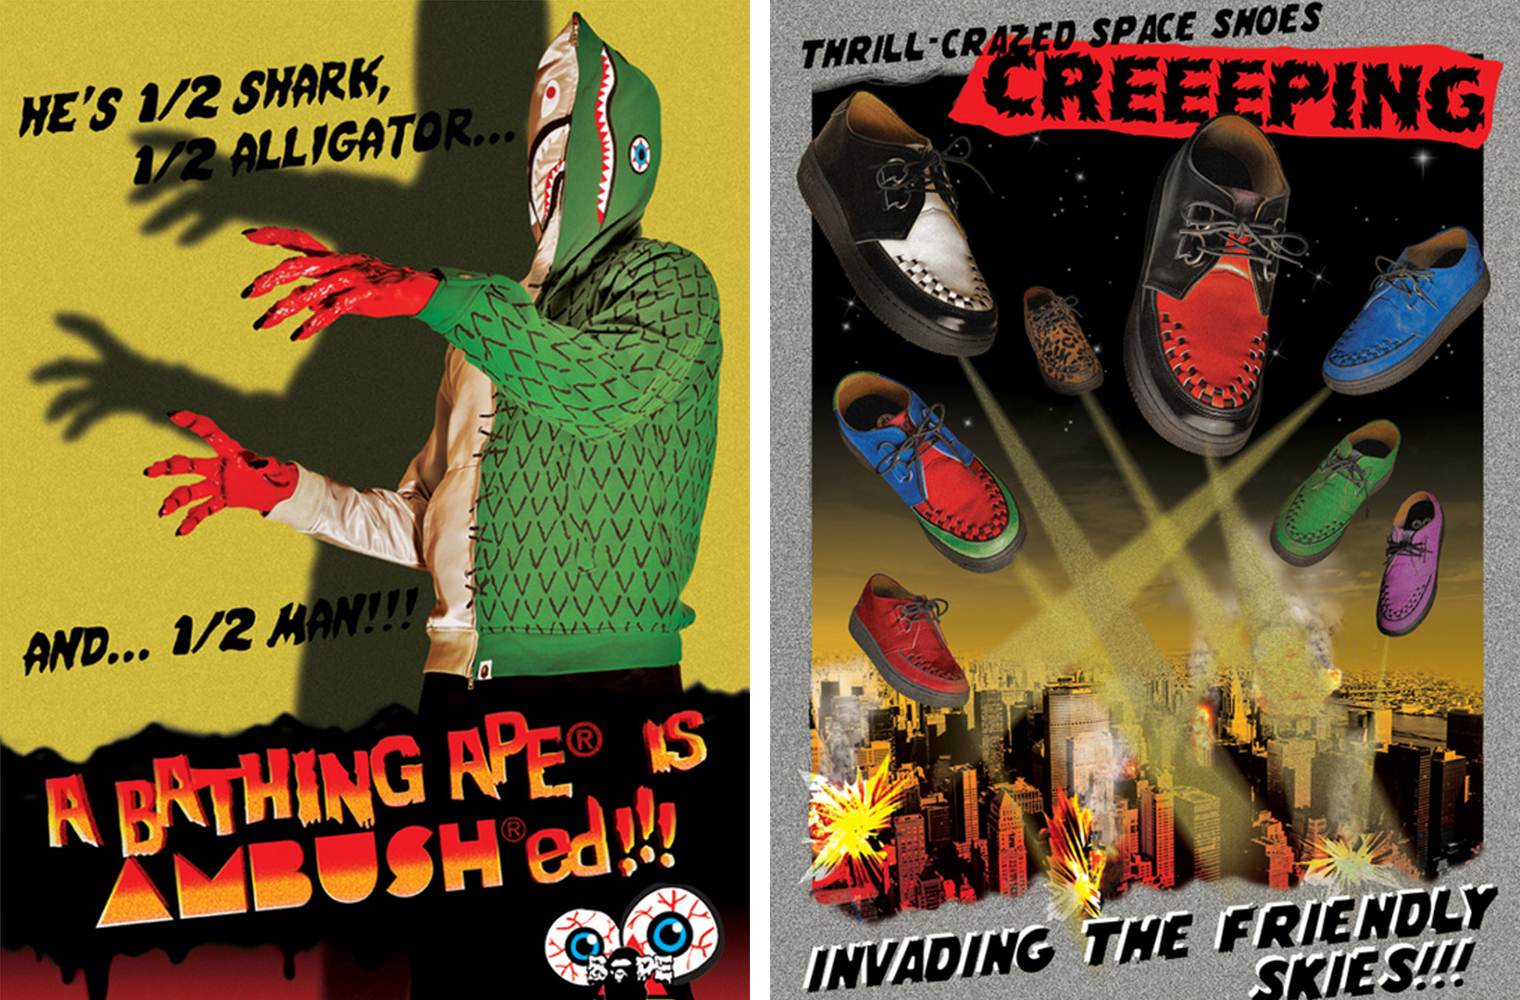 A BATHING APE x AMBUSH - рекламная кампания совместной коллекции 2009